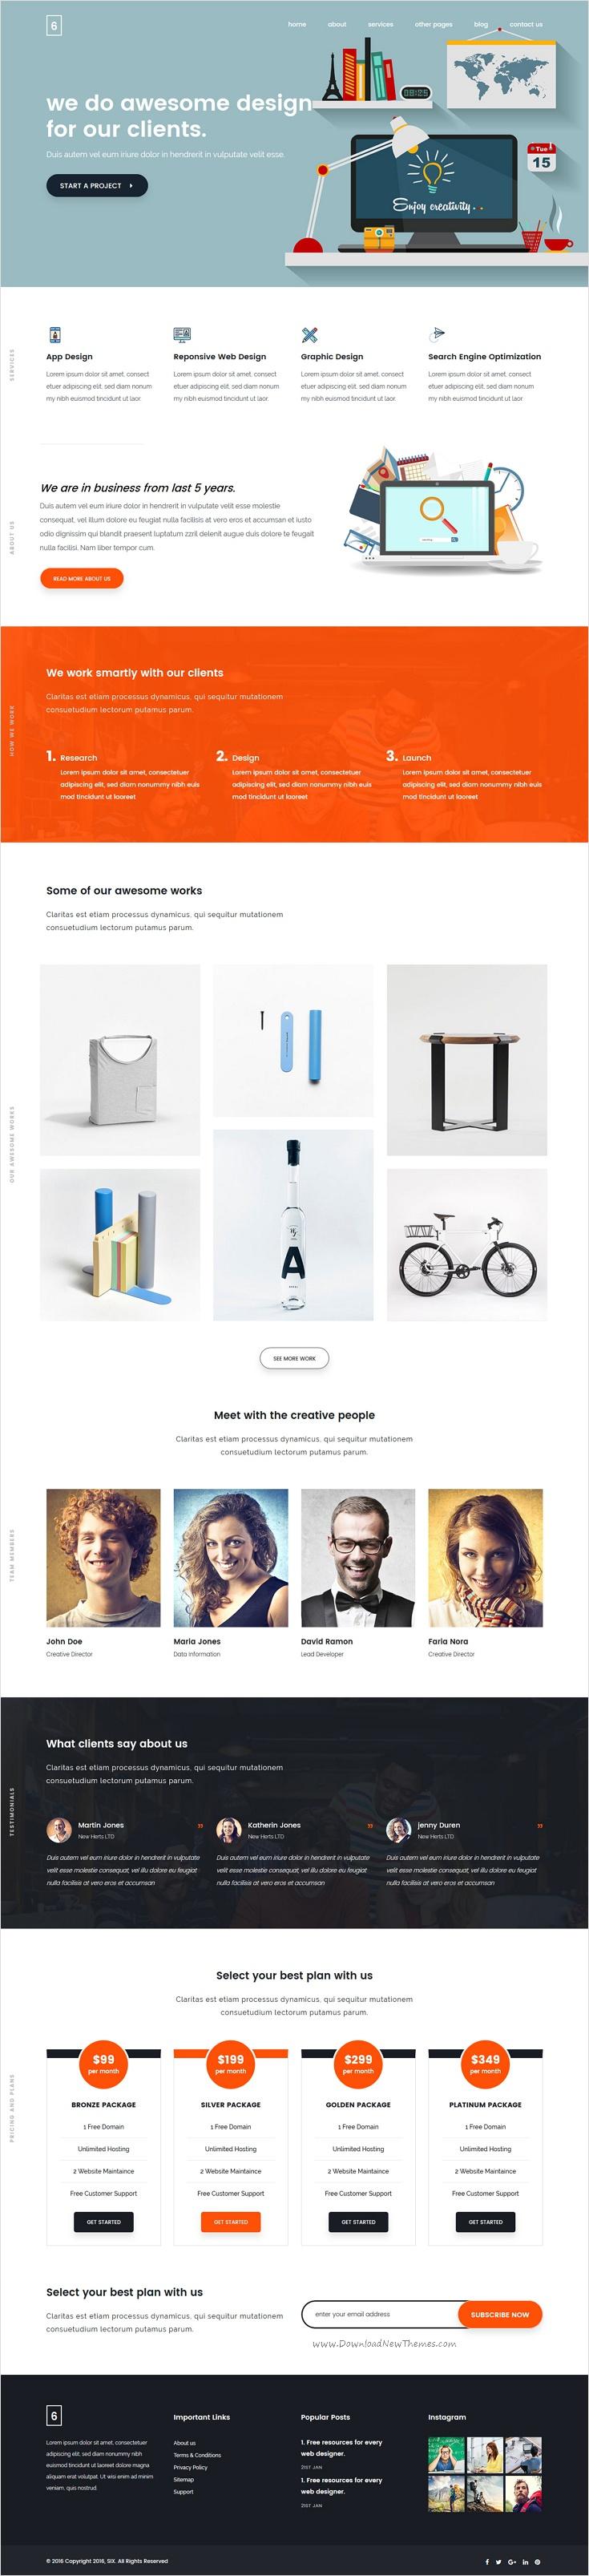 Pin by Hiren Panchal on 9 Web UI UX Pinterest